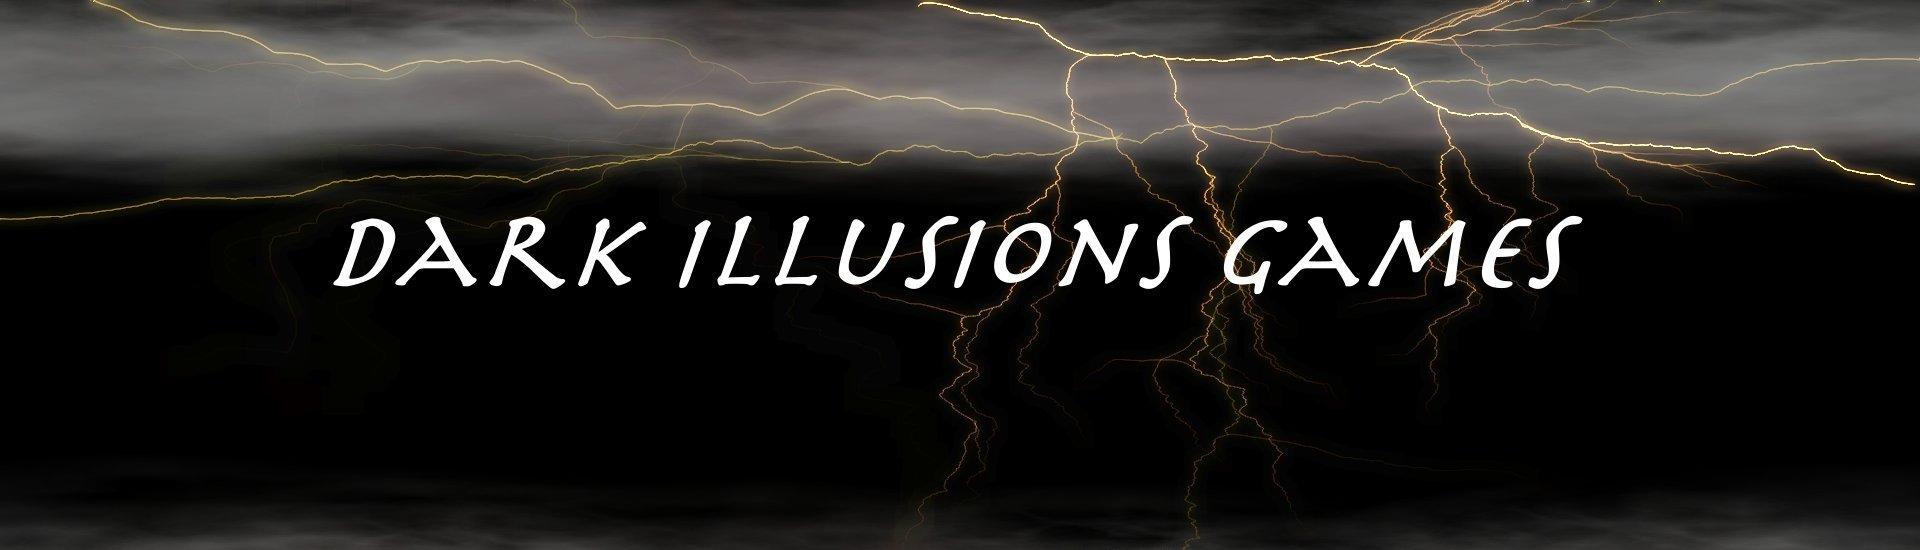 Dark Illusions Games cover